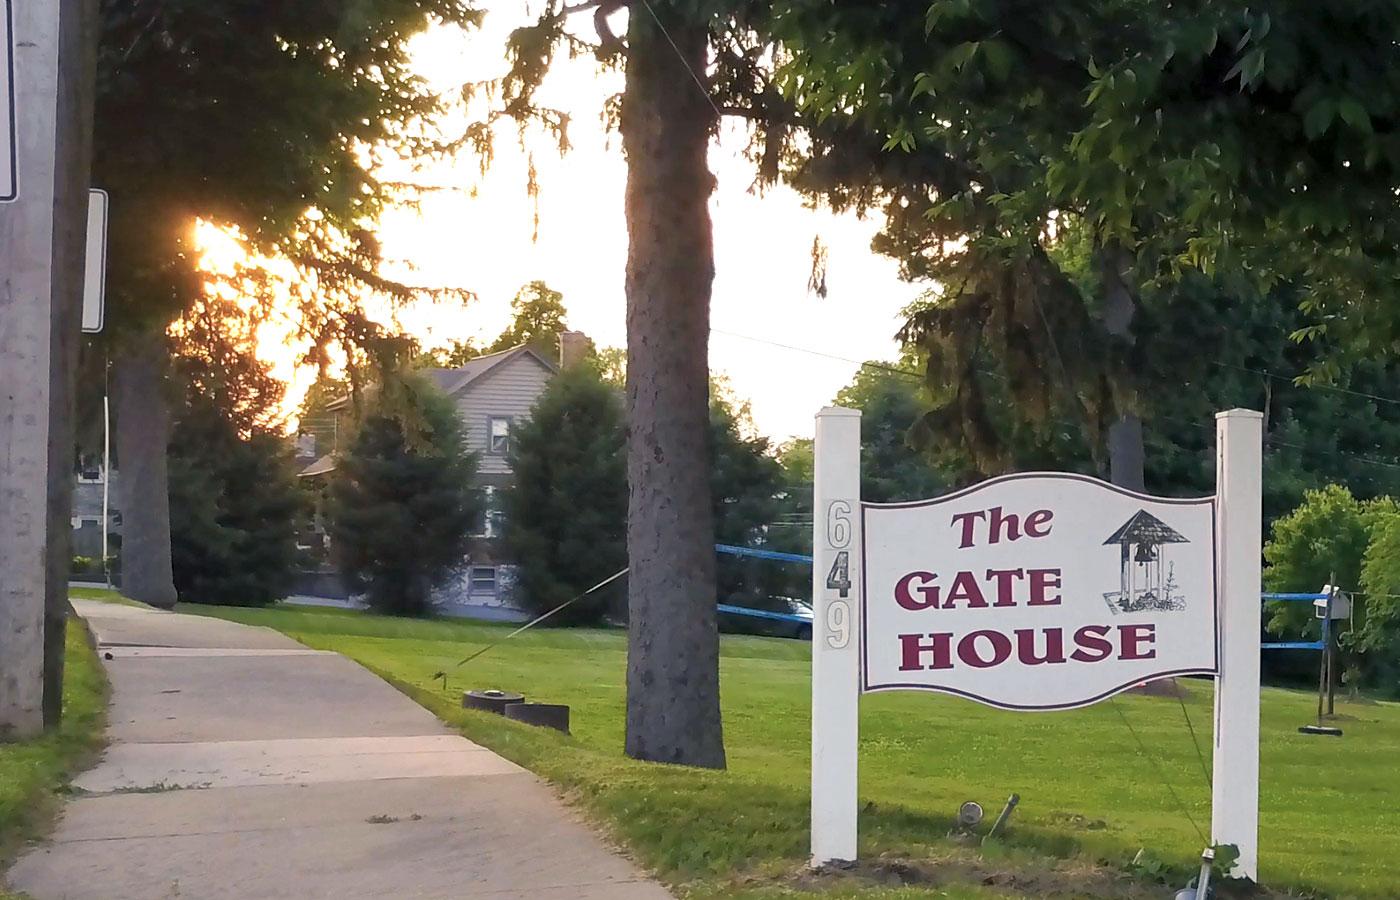 GateHouse Transitional Living